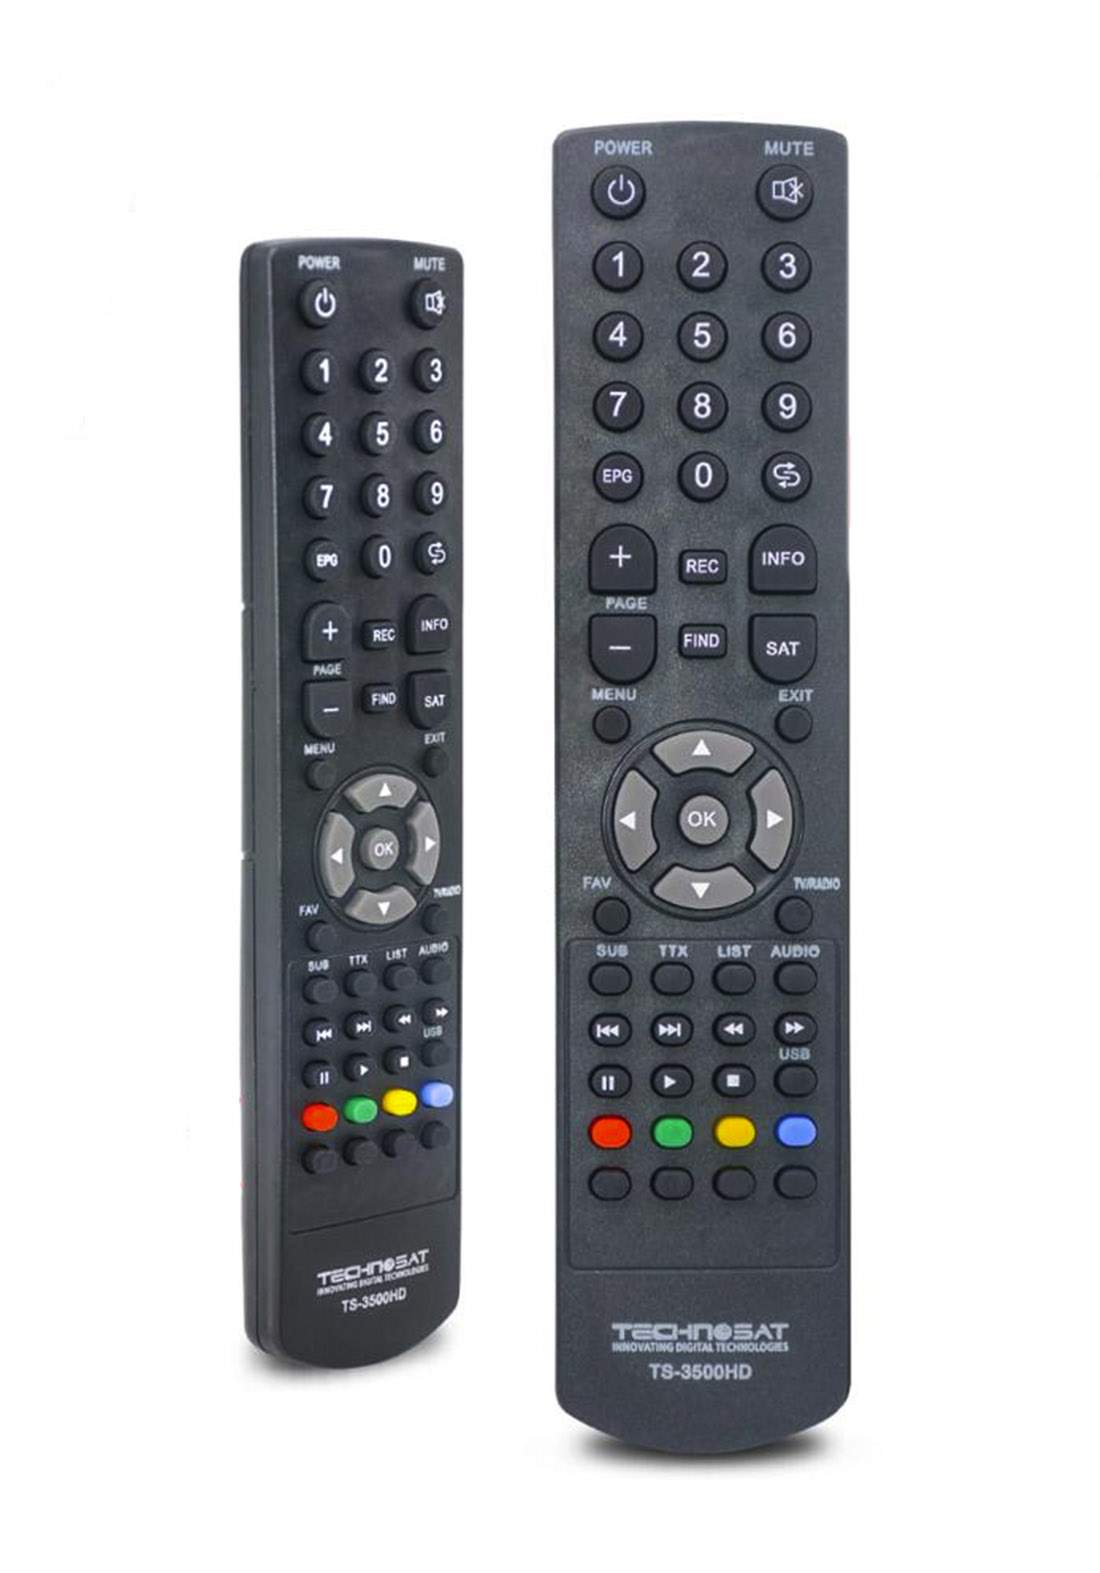 Remote Control For Technosat Plasma TV (A-220) جهاز تحكم عن بعد